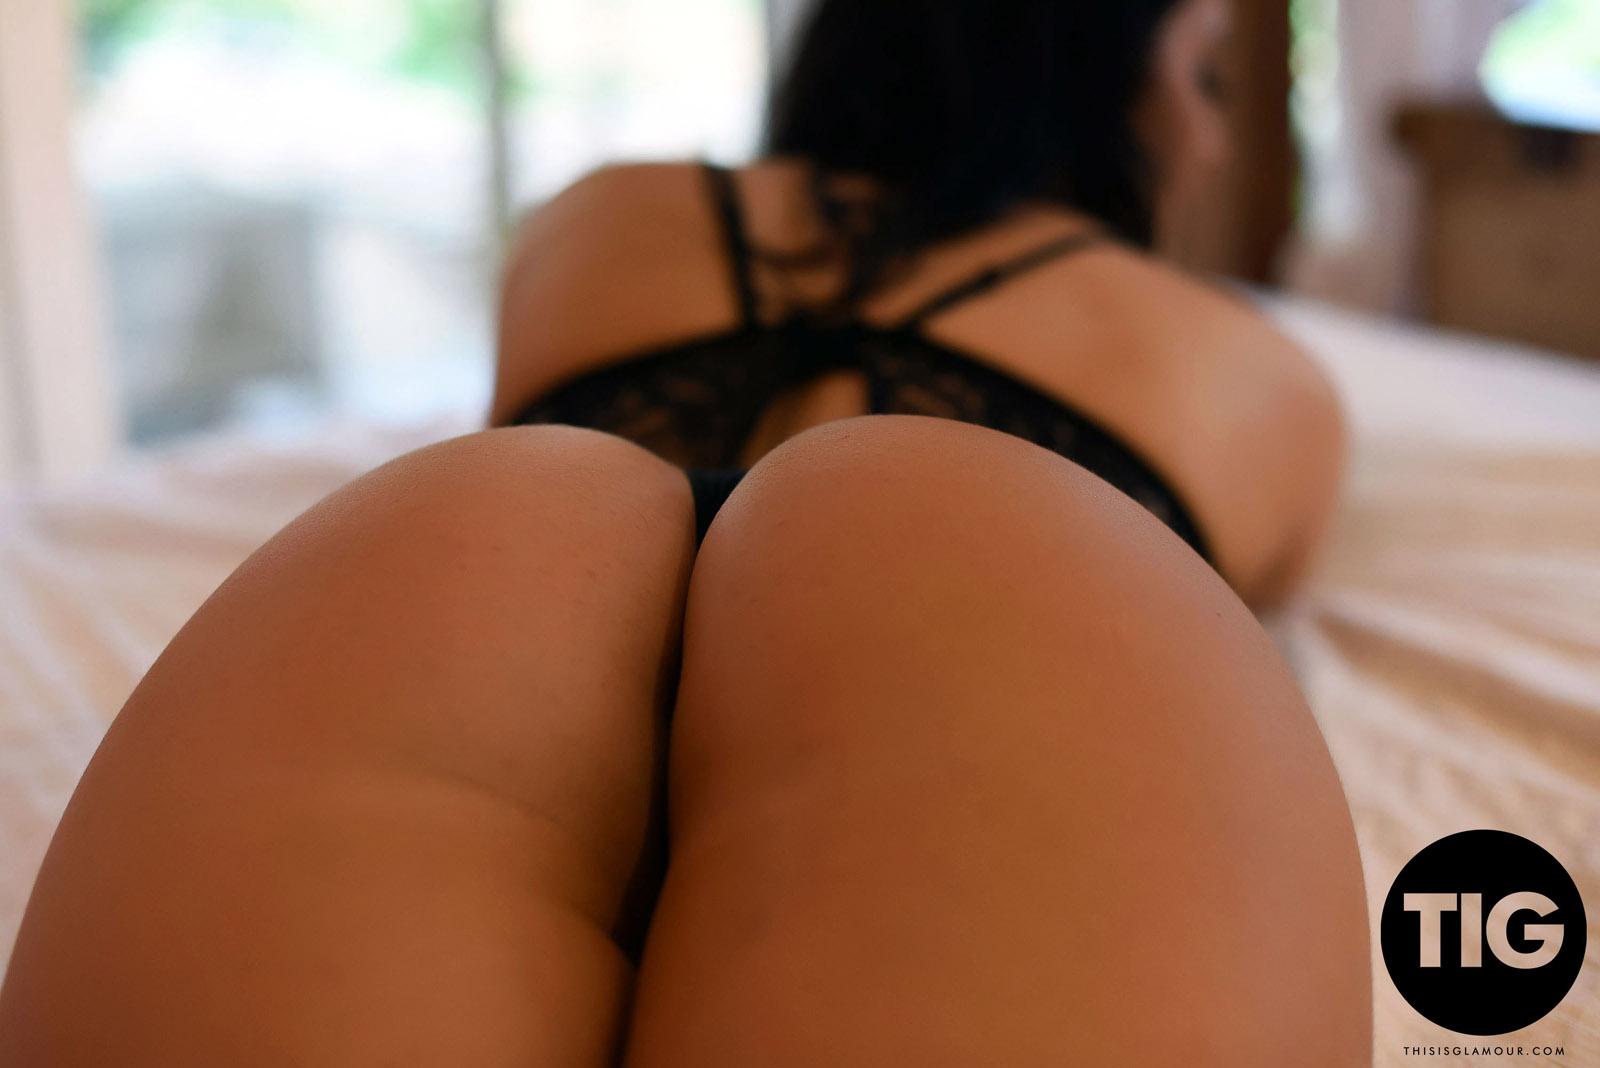 Ashleigh Gee Porno ashleigh gee black lingerie desire - cherry nudes